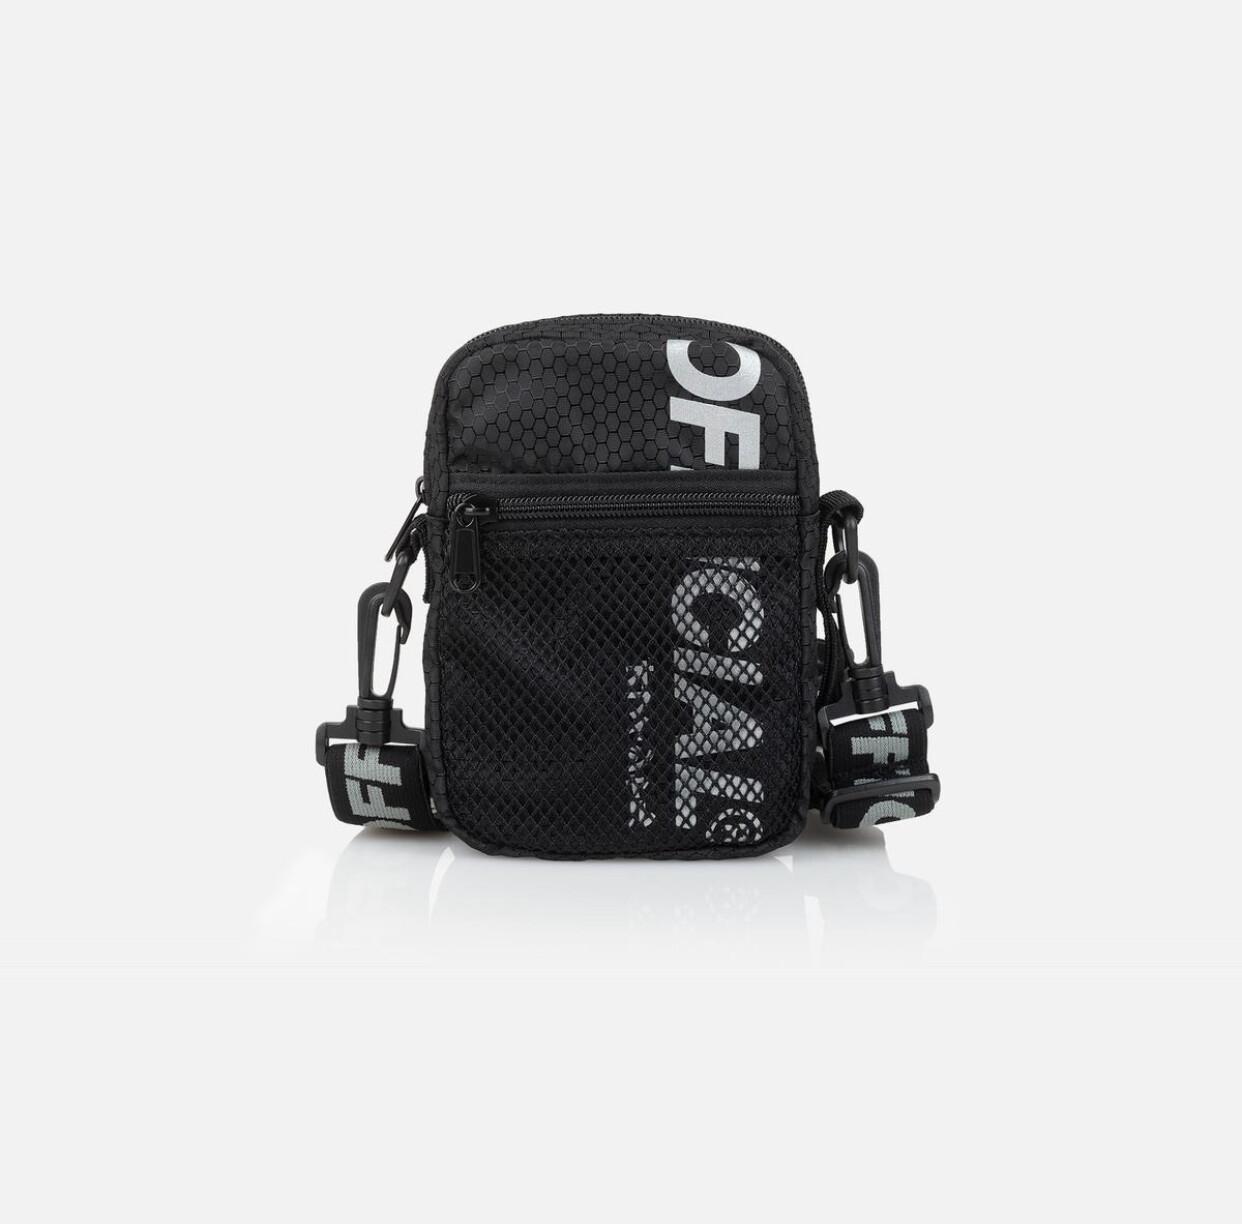 Official Black w/ Grey Bag